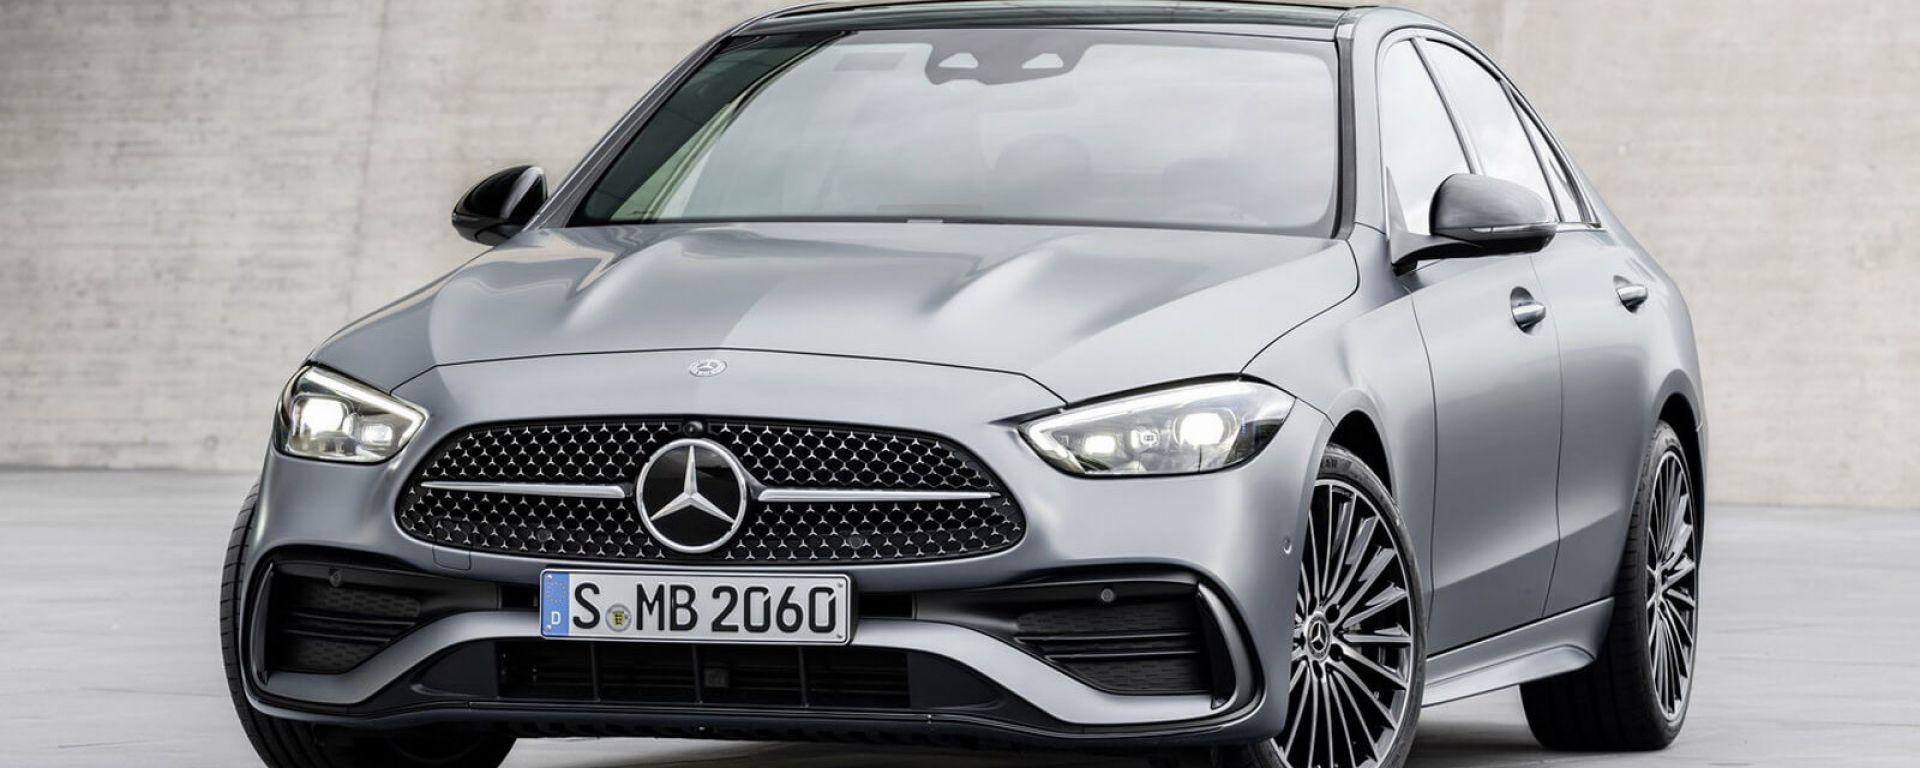 Mercedes Classe C AMG: il rendering di XTomi la immagina così